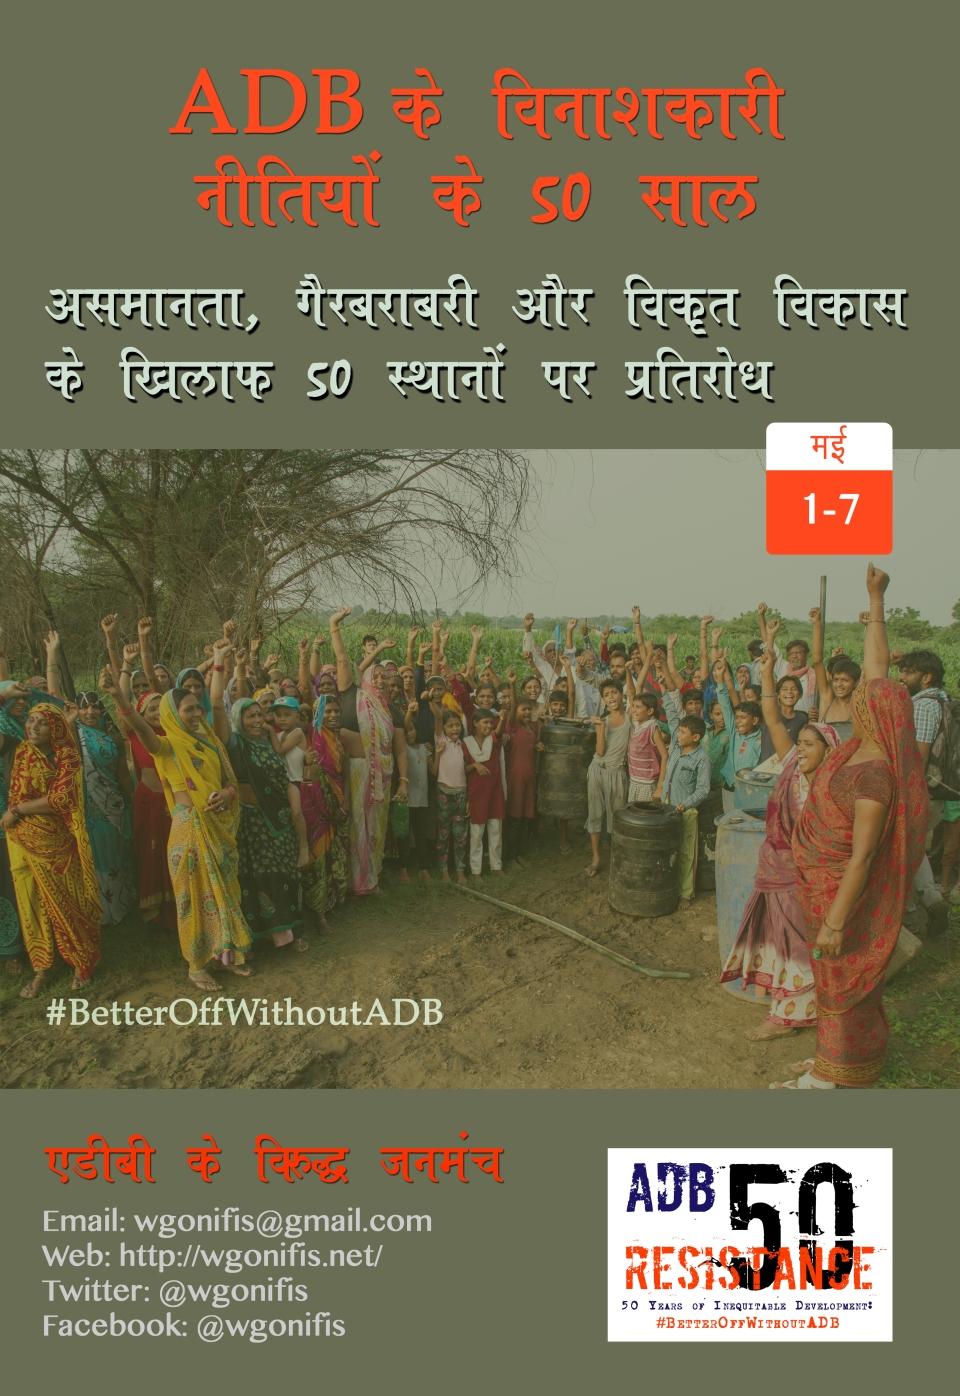 ADB 50 year Poster Hindi